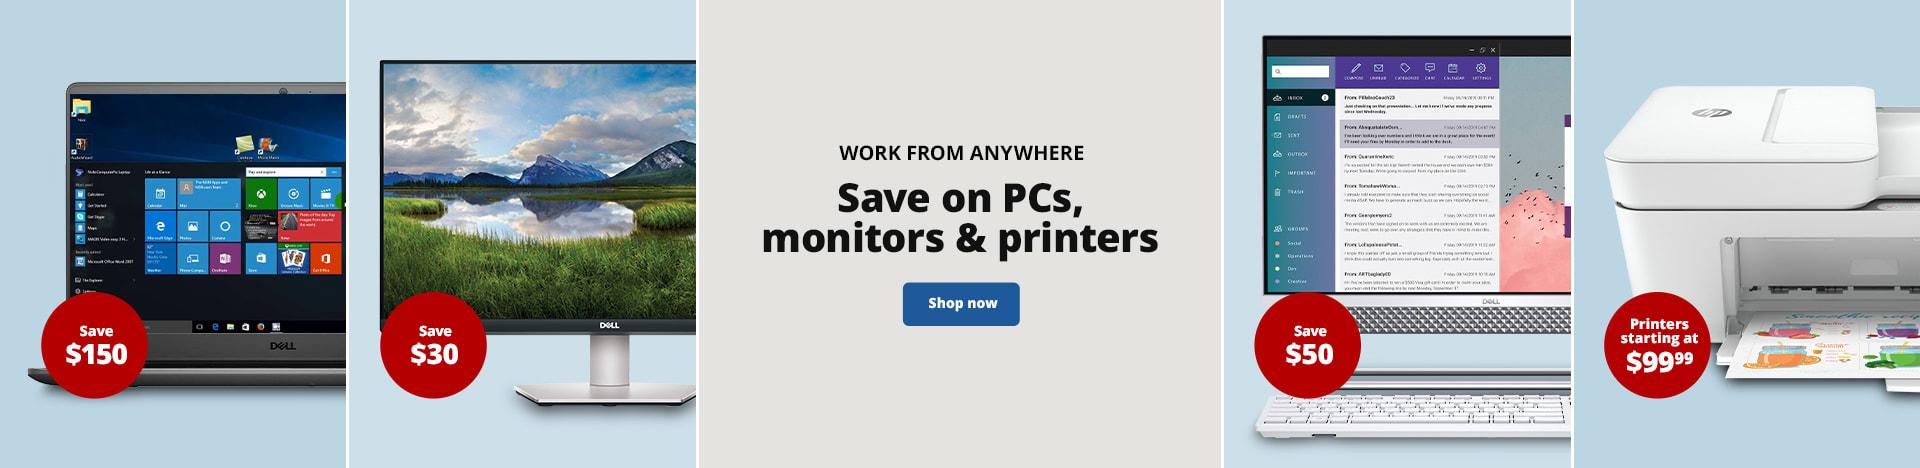 Organize & Save Time. Save on PCs, monitors & printers